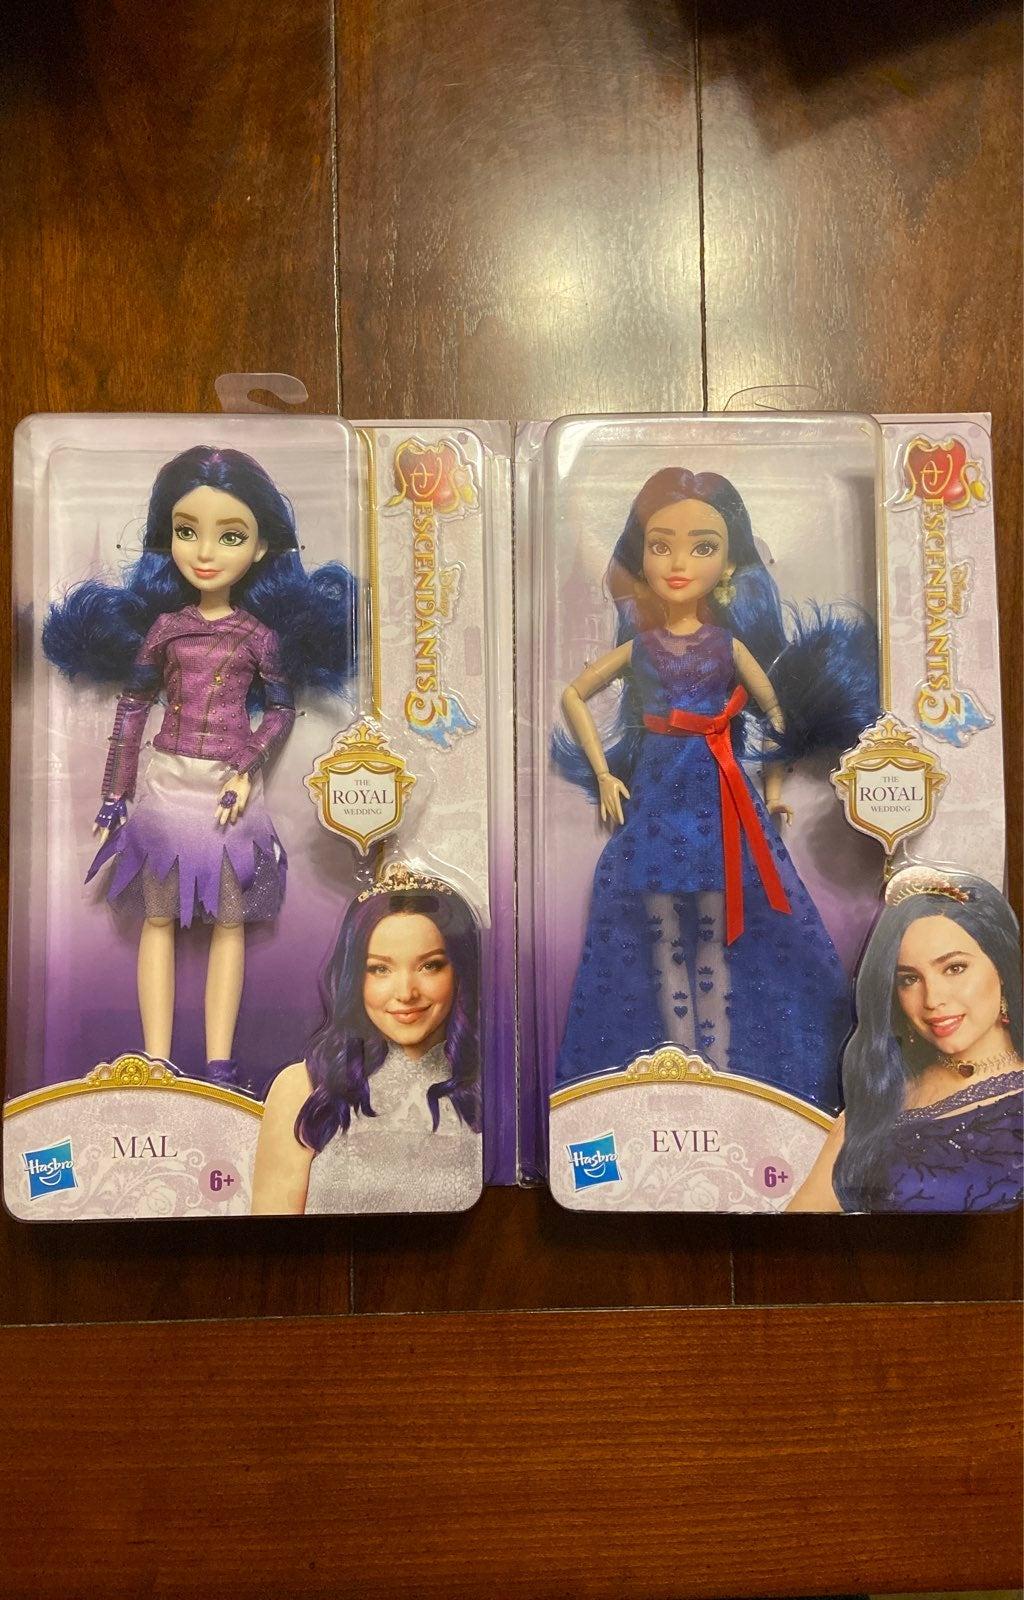 Mal & Evie Doll The Royal Wedding Bundle